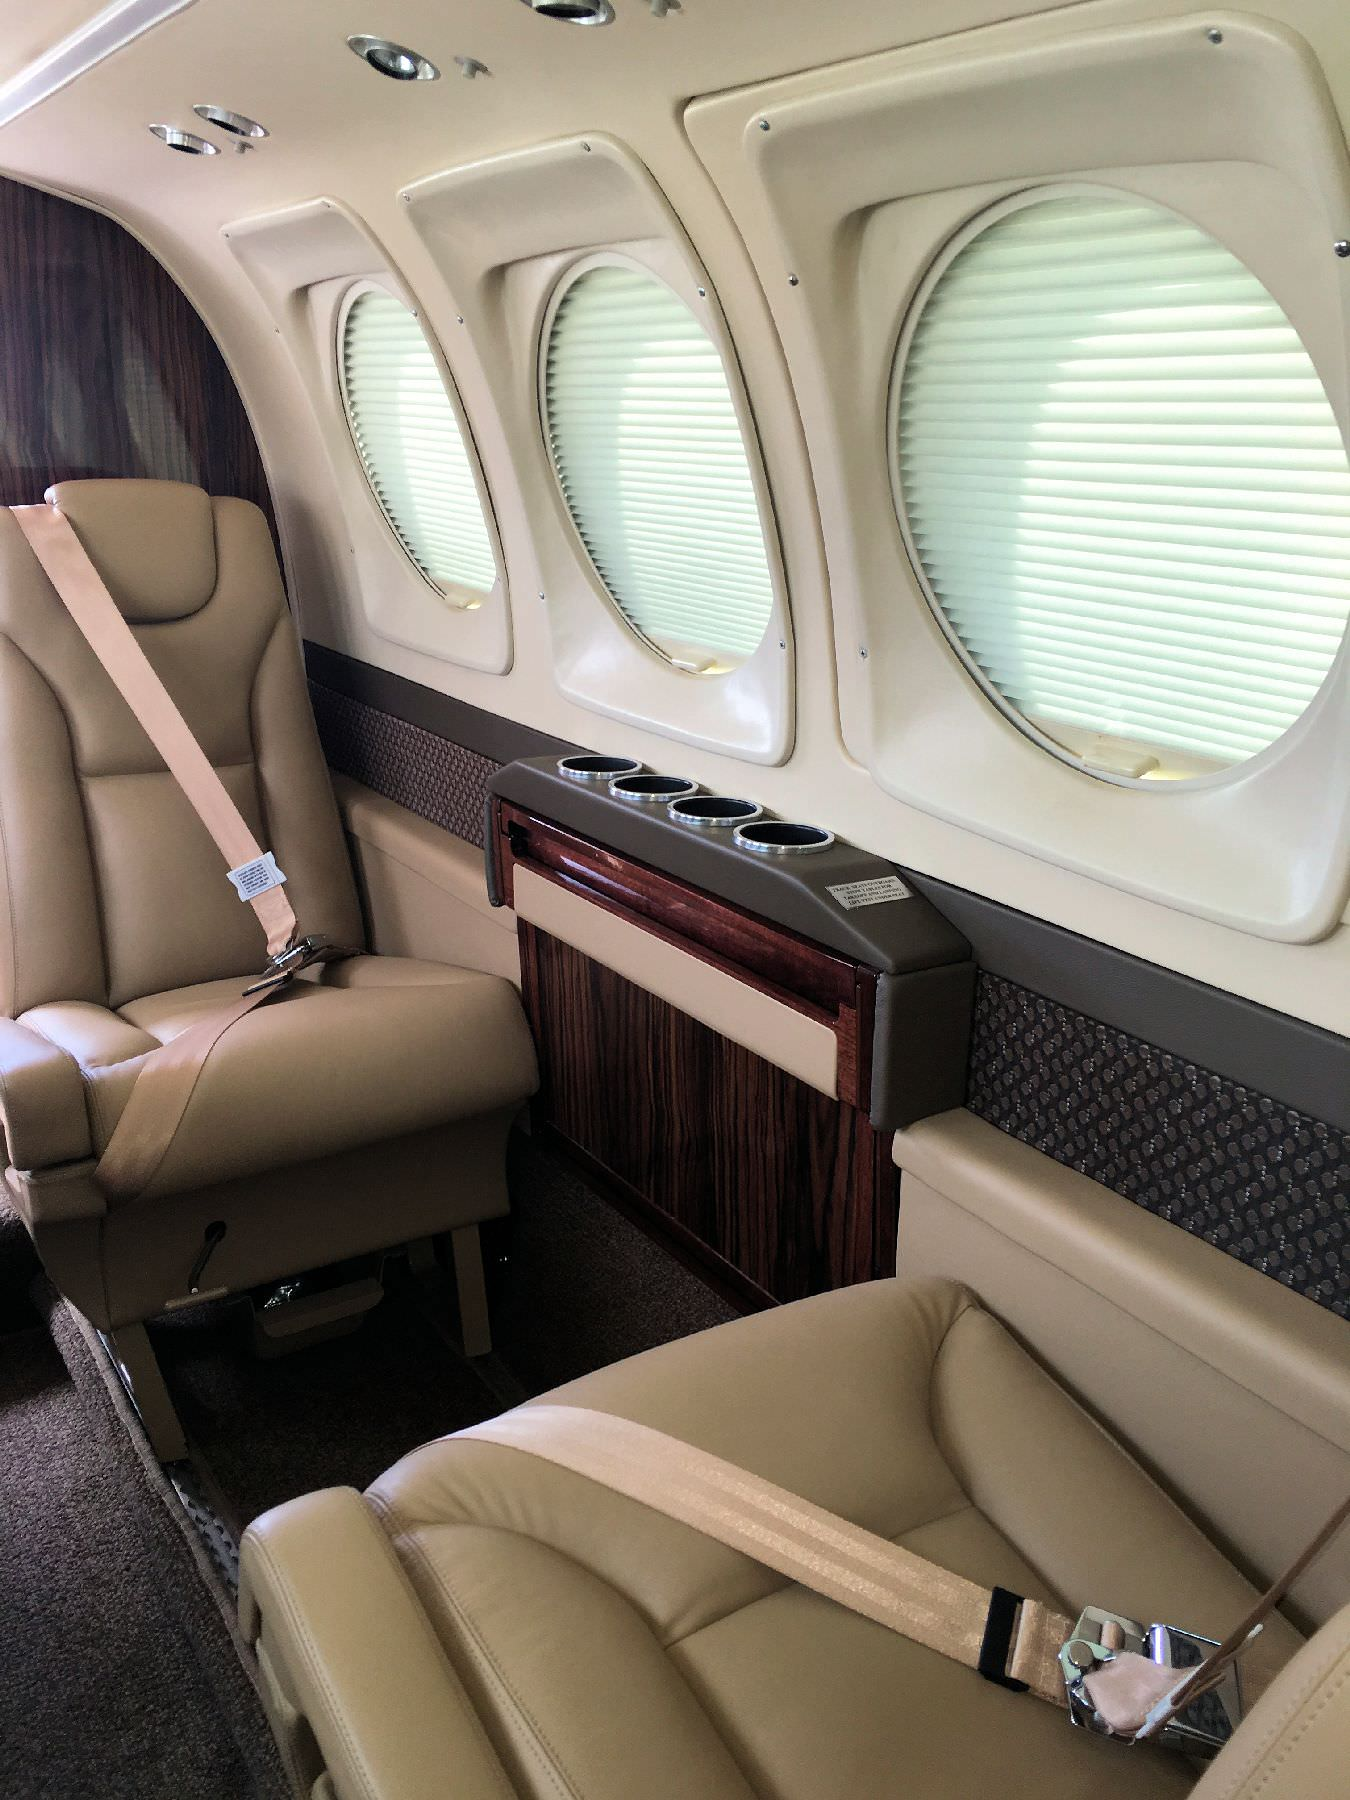 King Air 90 Arm Ledge Table System